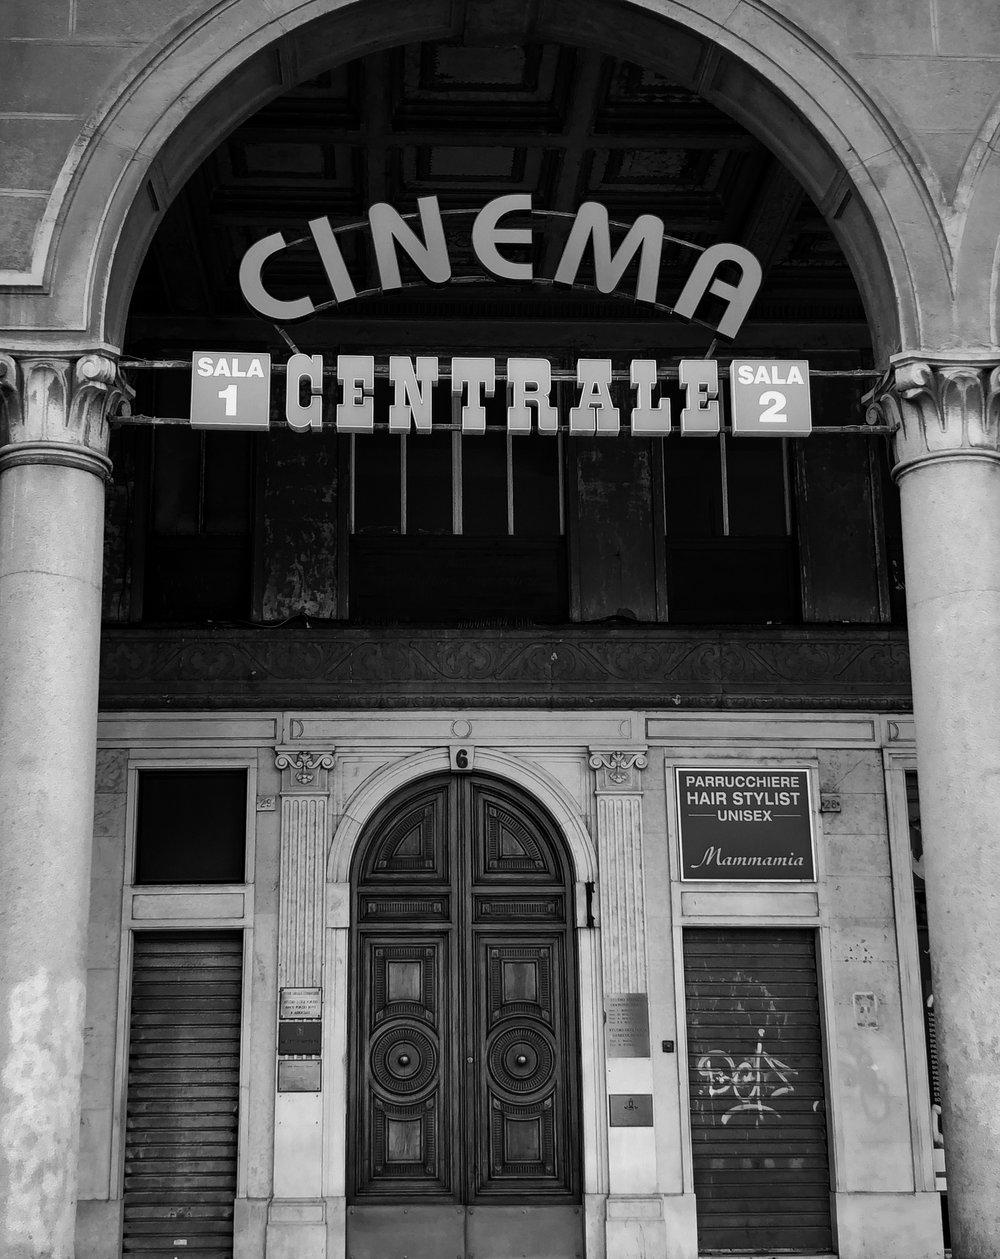 Historic Genova cinema center in Italy 🇮🇹  #italy   #genova  #historic   #cinema   #film   #sound   #europe   #photography   #monochrome   #blackandwhite   #iphone   #canon   #adobe  #fashion   #vogue   #movies    #italian cinema